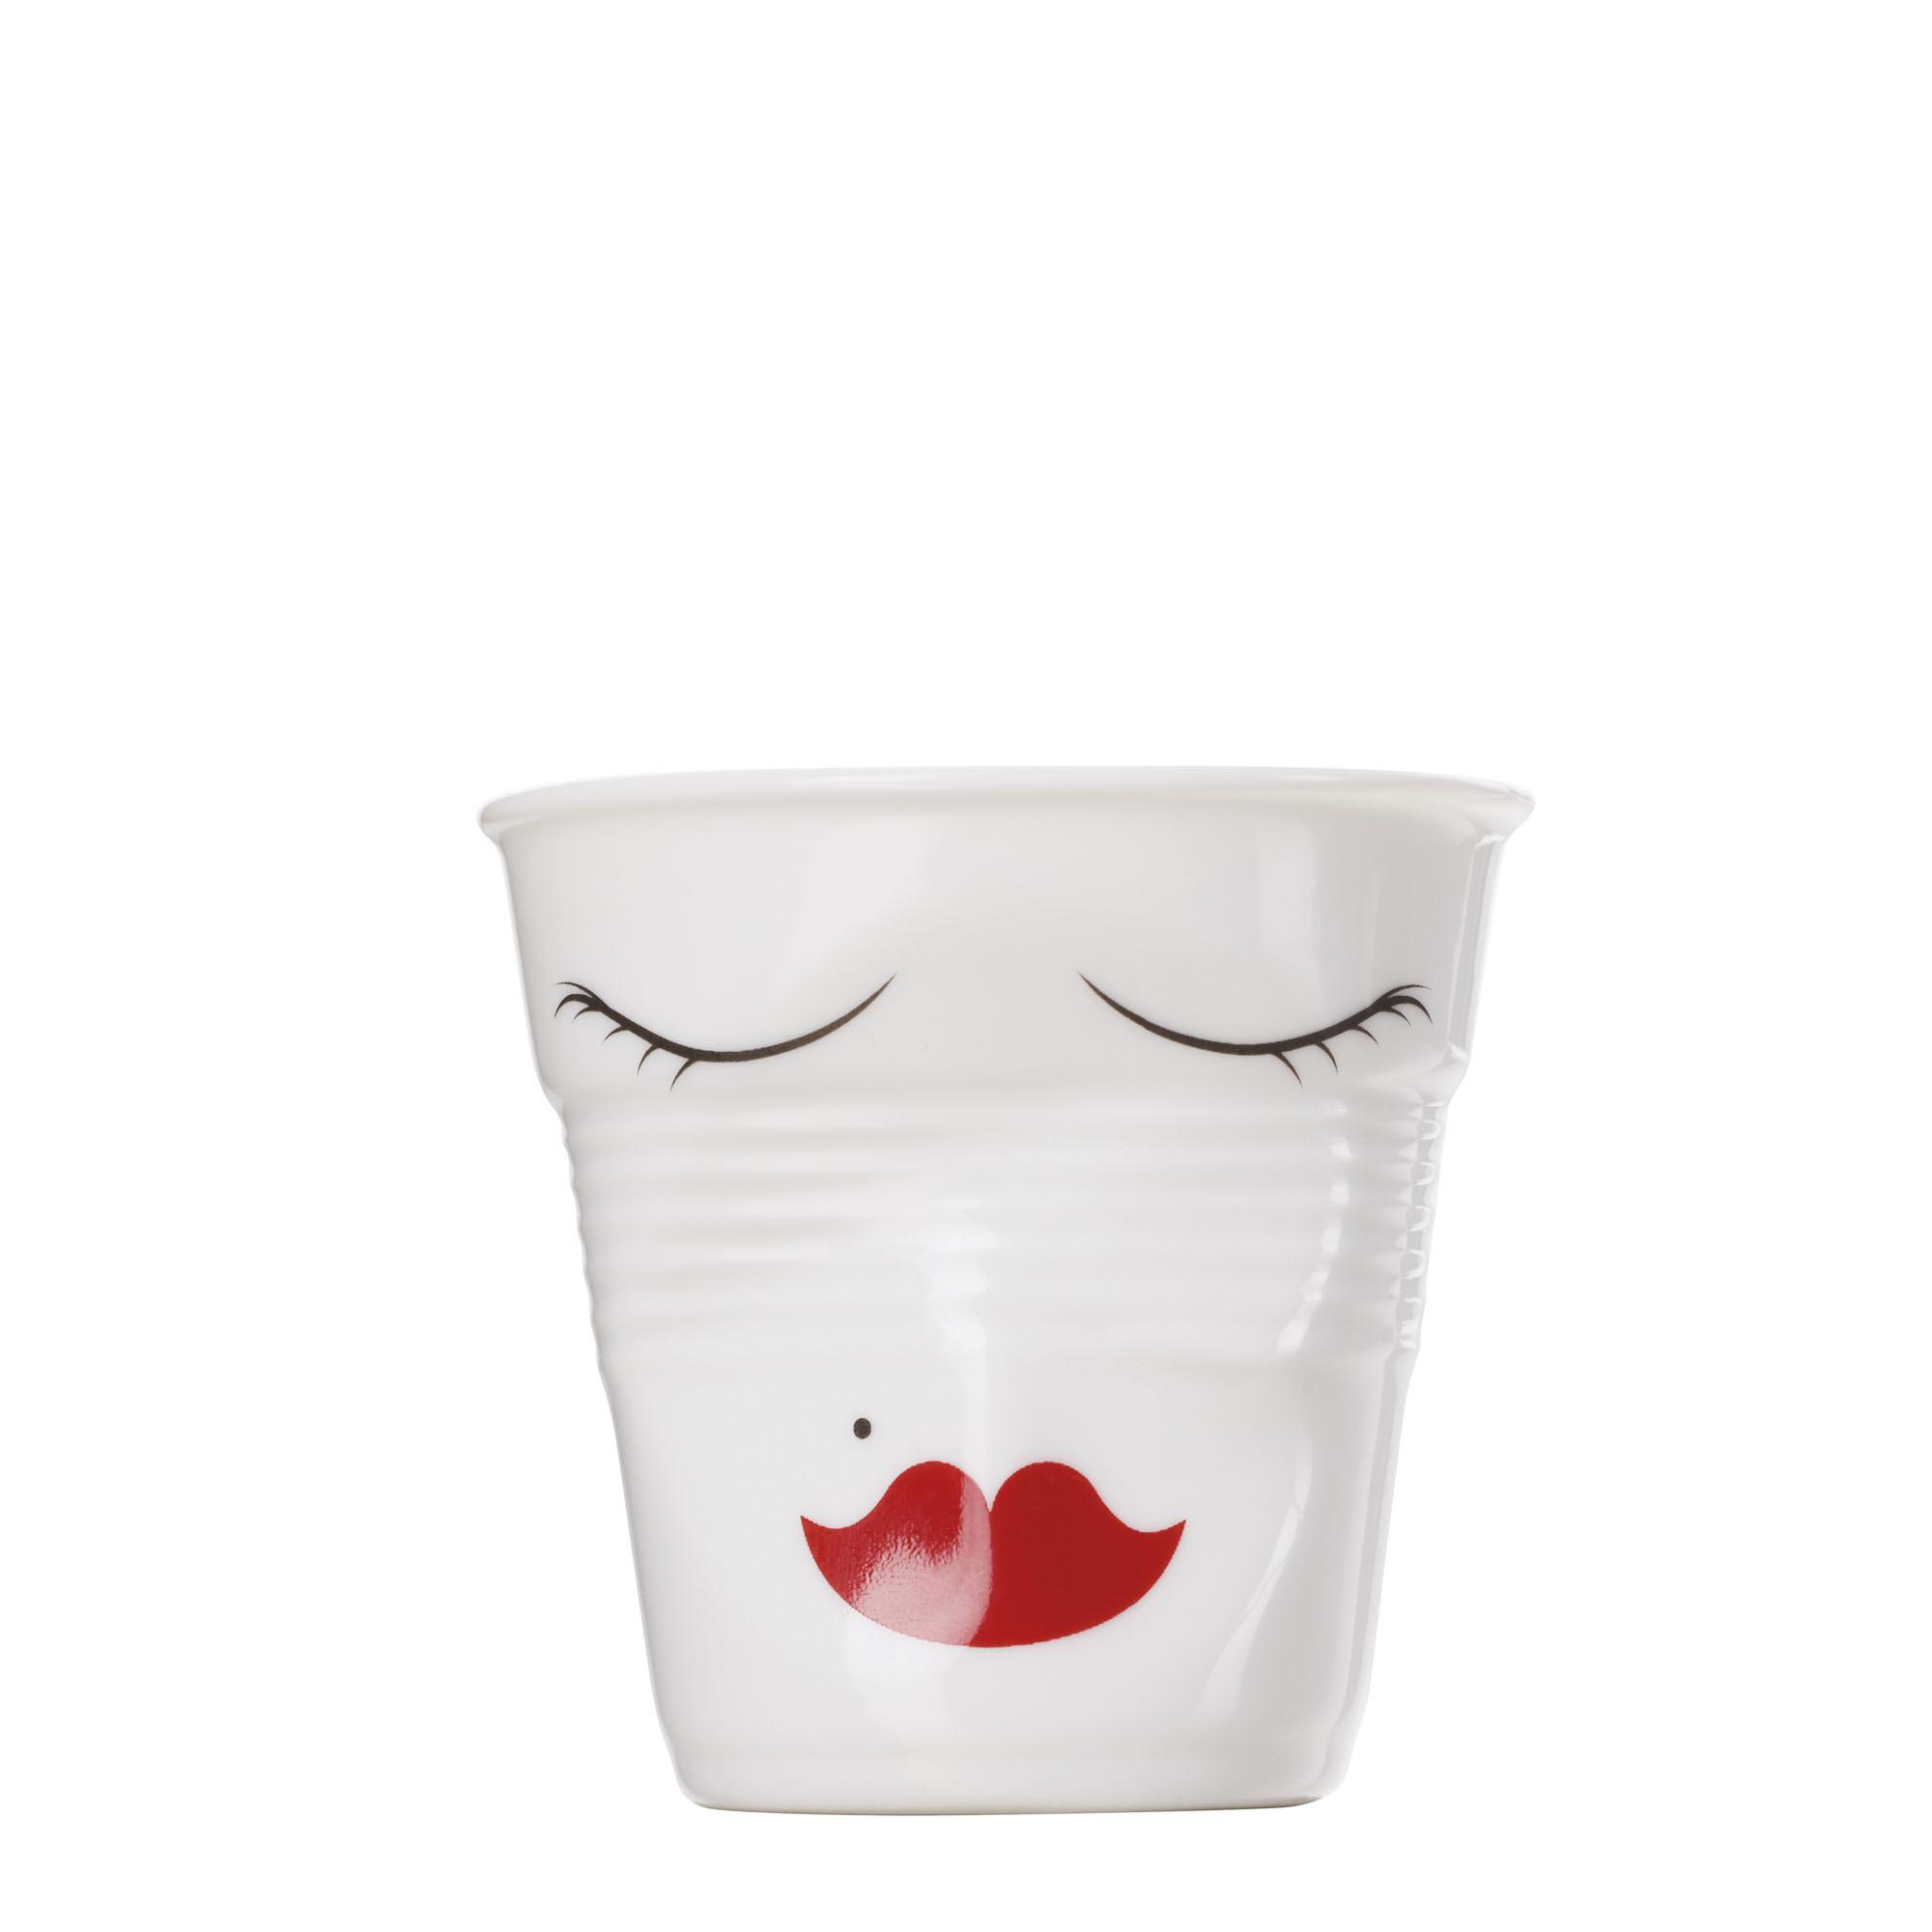 Blanc Madame - Made in France - Uncoqdansletransat